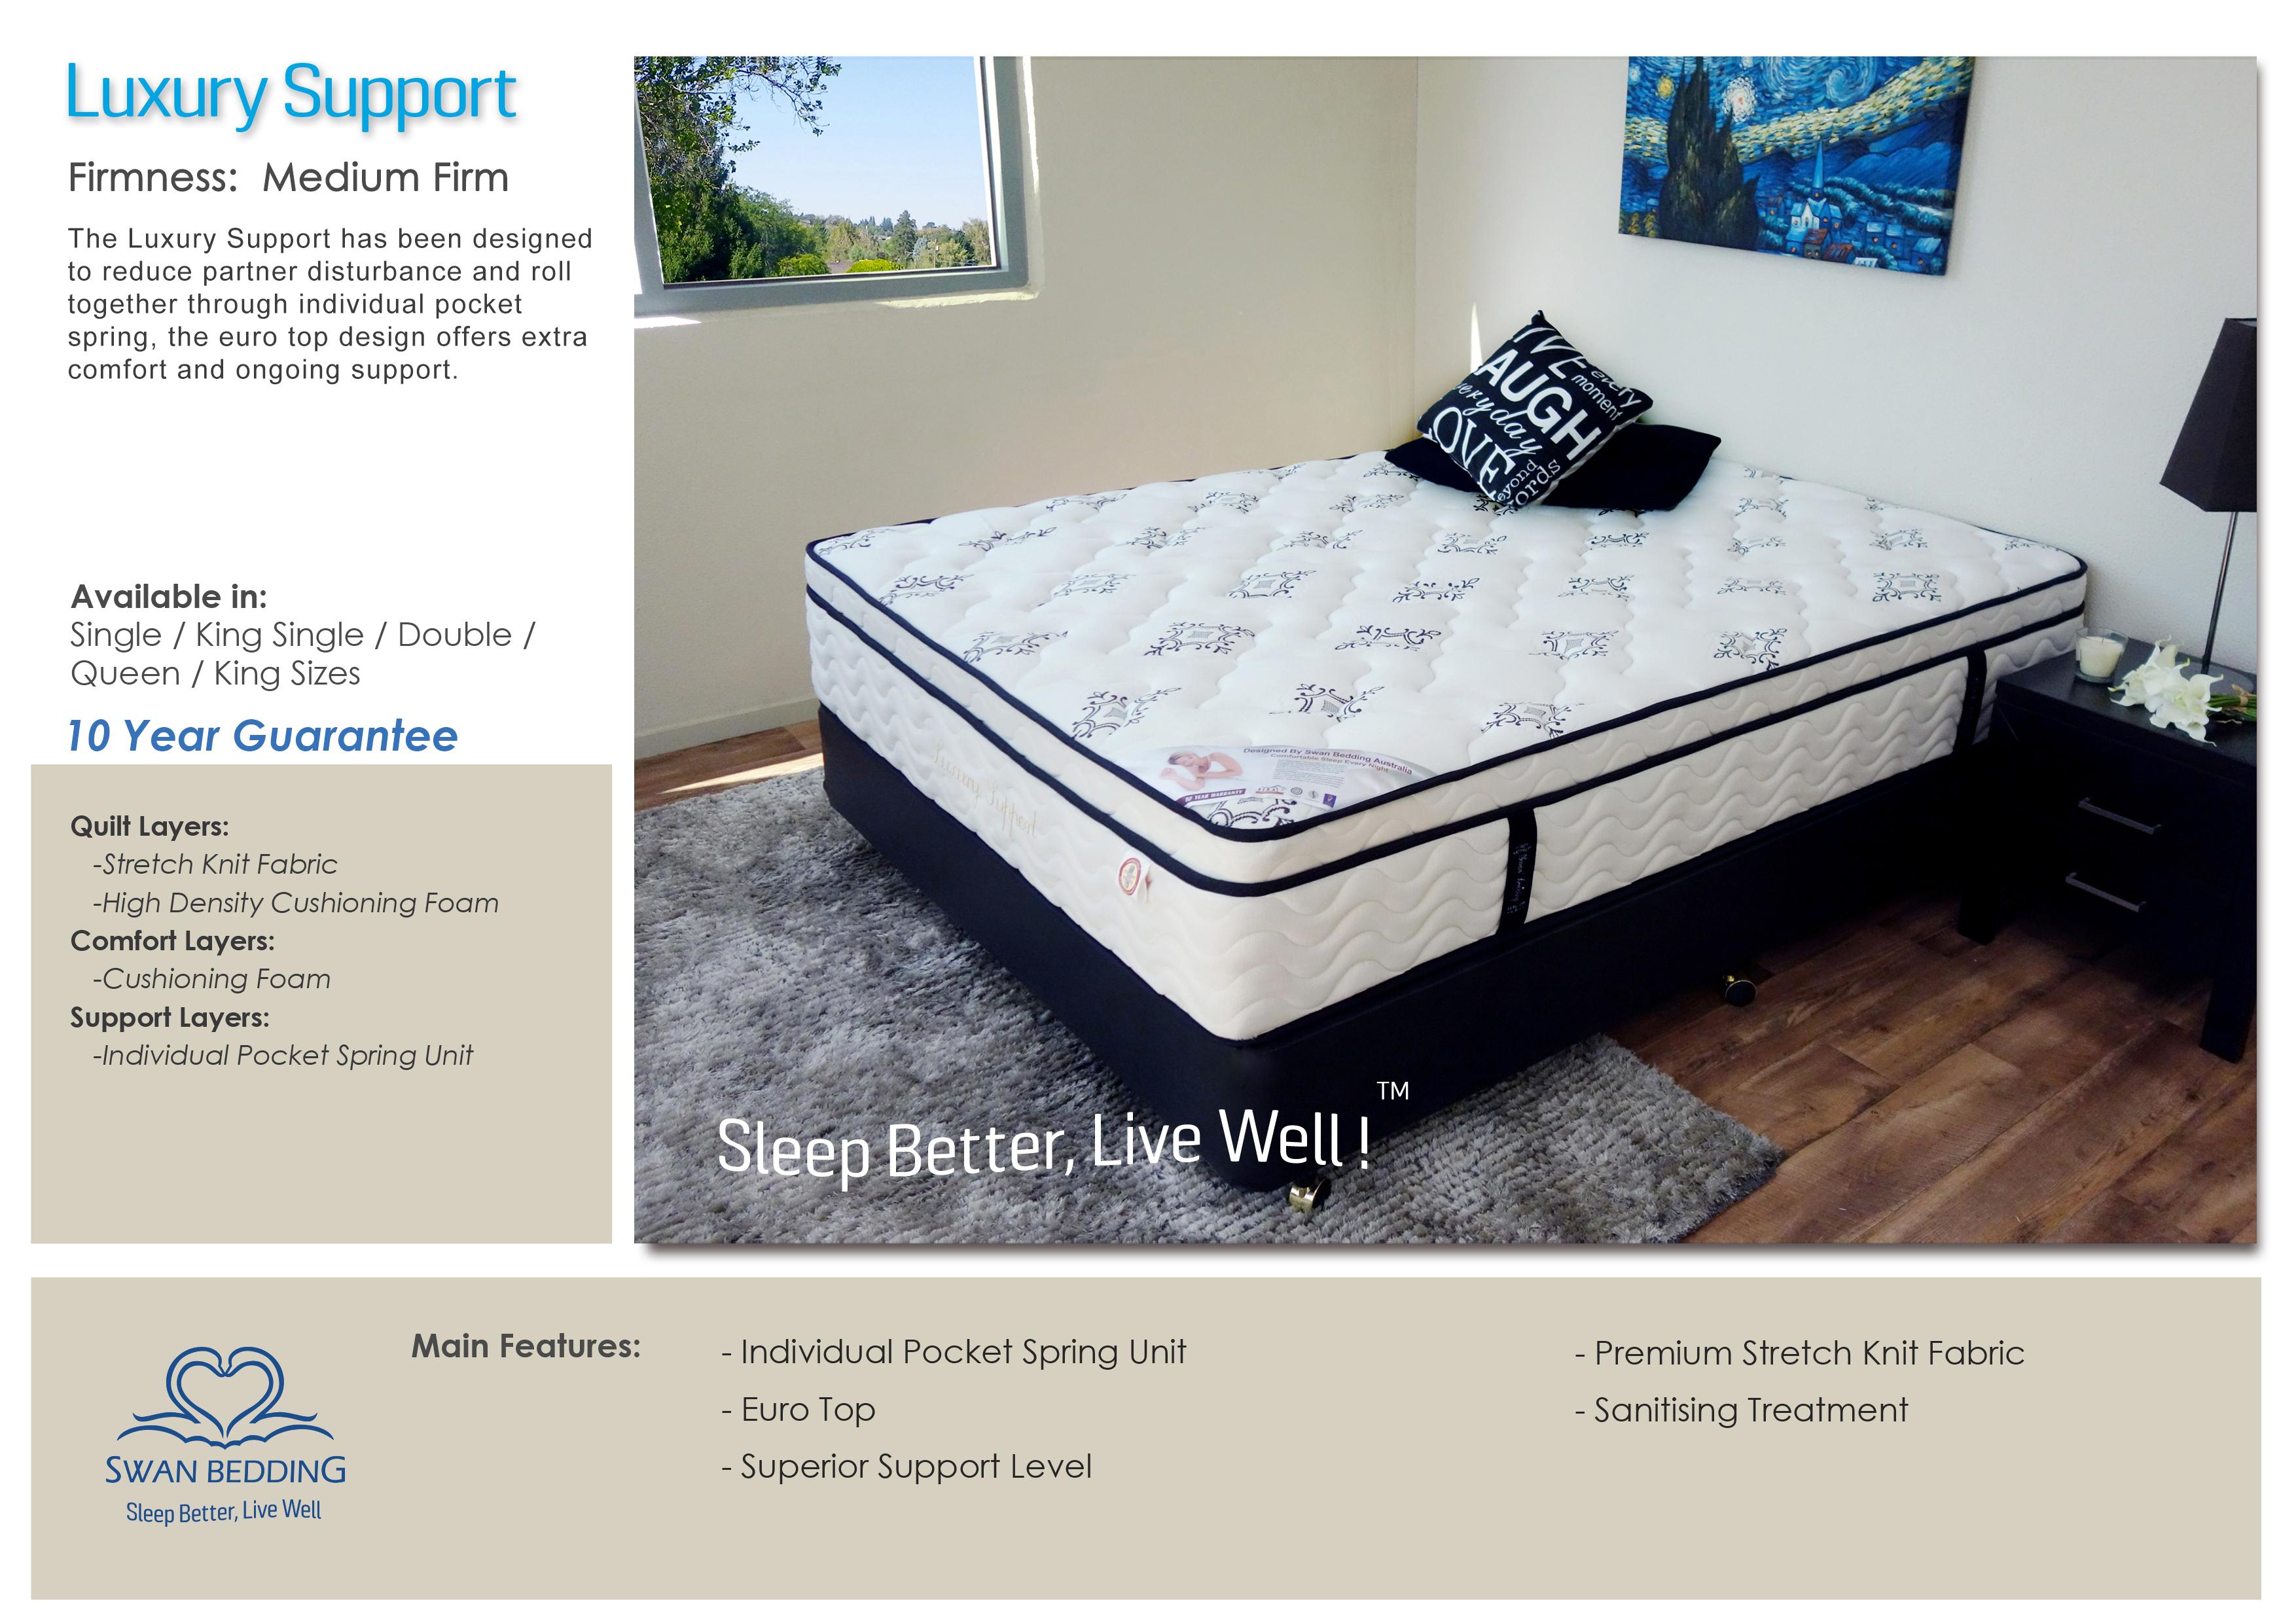 8 Luxury Support